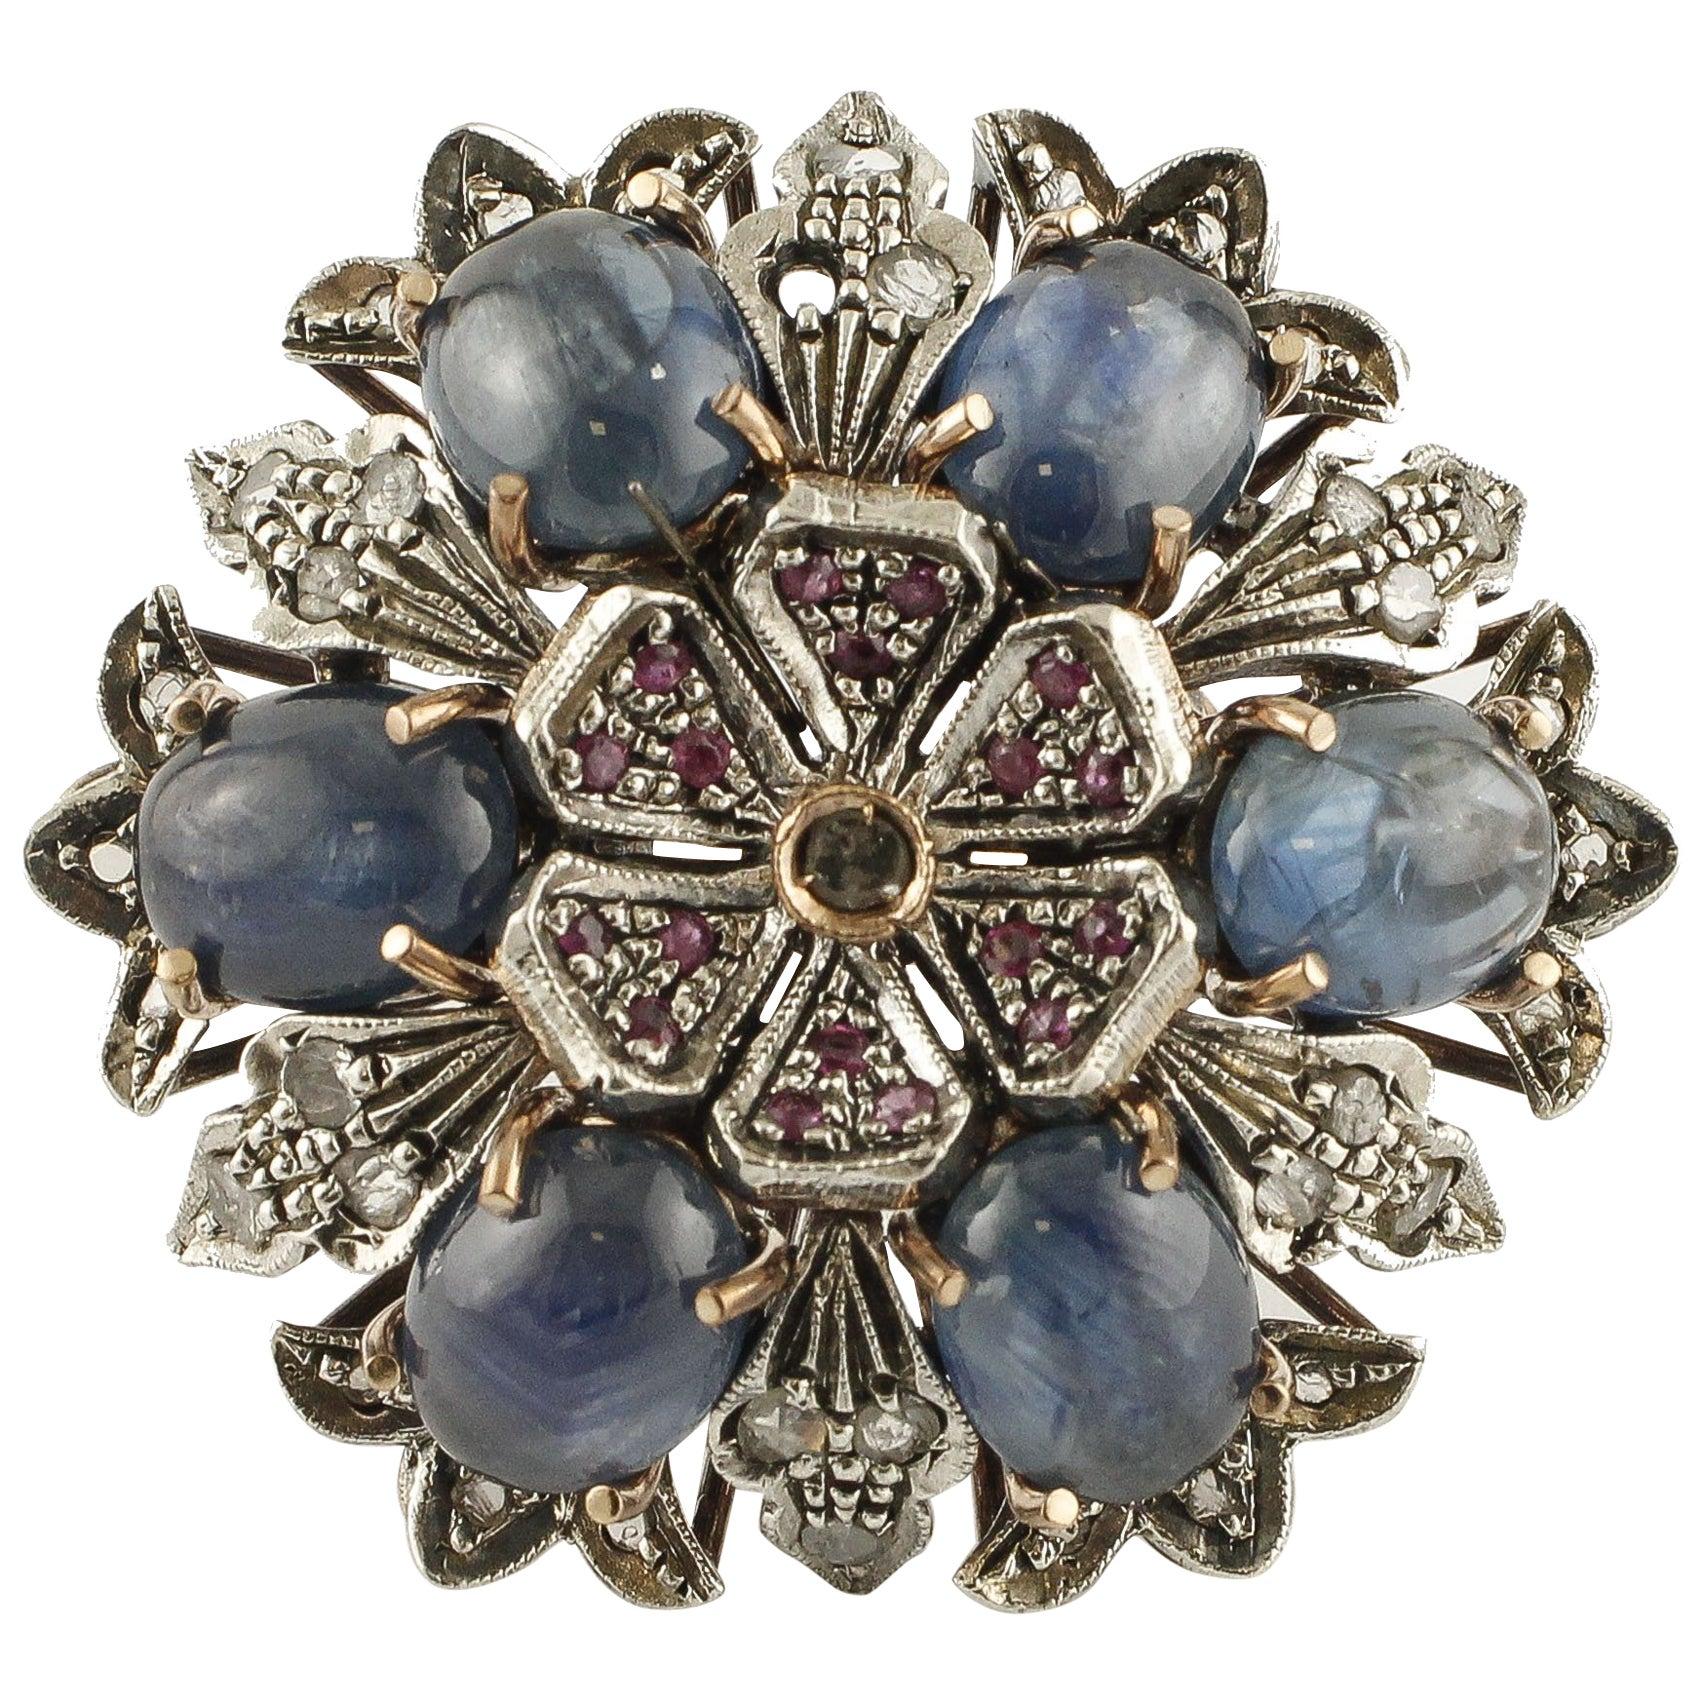 Rubies, Blue Sapphires, Diamonds 9 Karat Gold and Silver Flowery Retro Ring